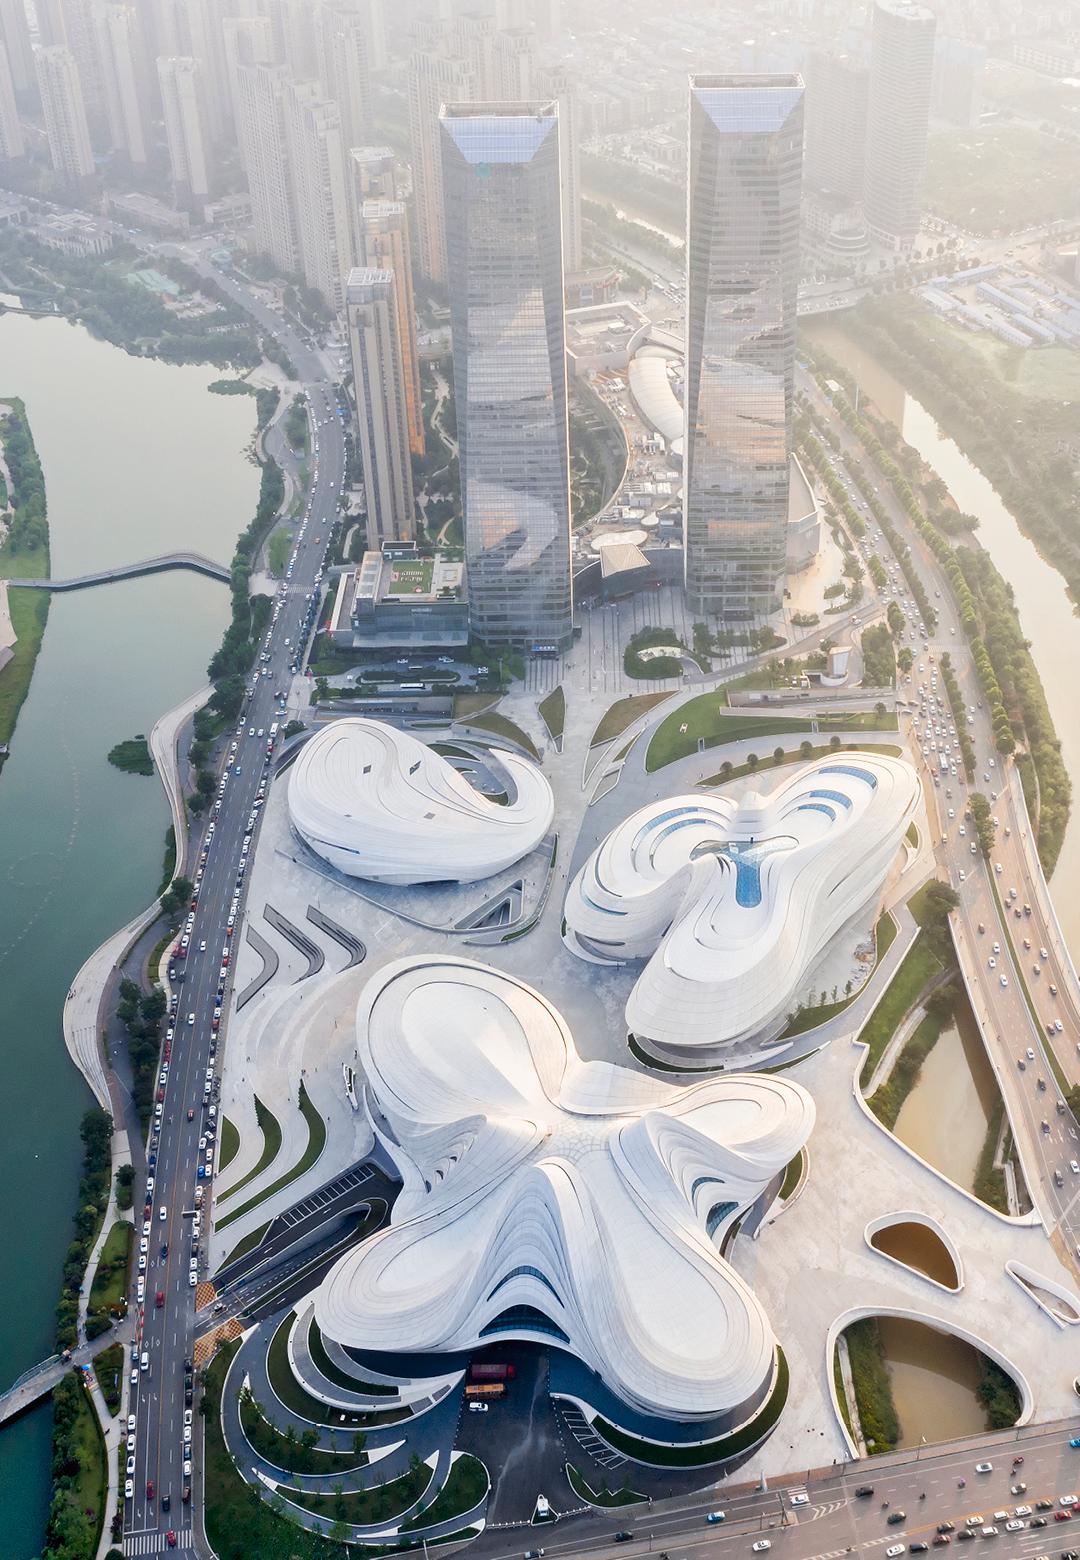 Meixihu International Culture & Arts Centre, Changsha, Shenzhen, China | Art Museum | China | STIRworld